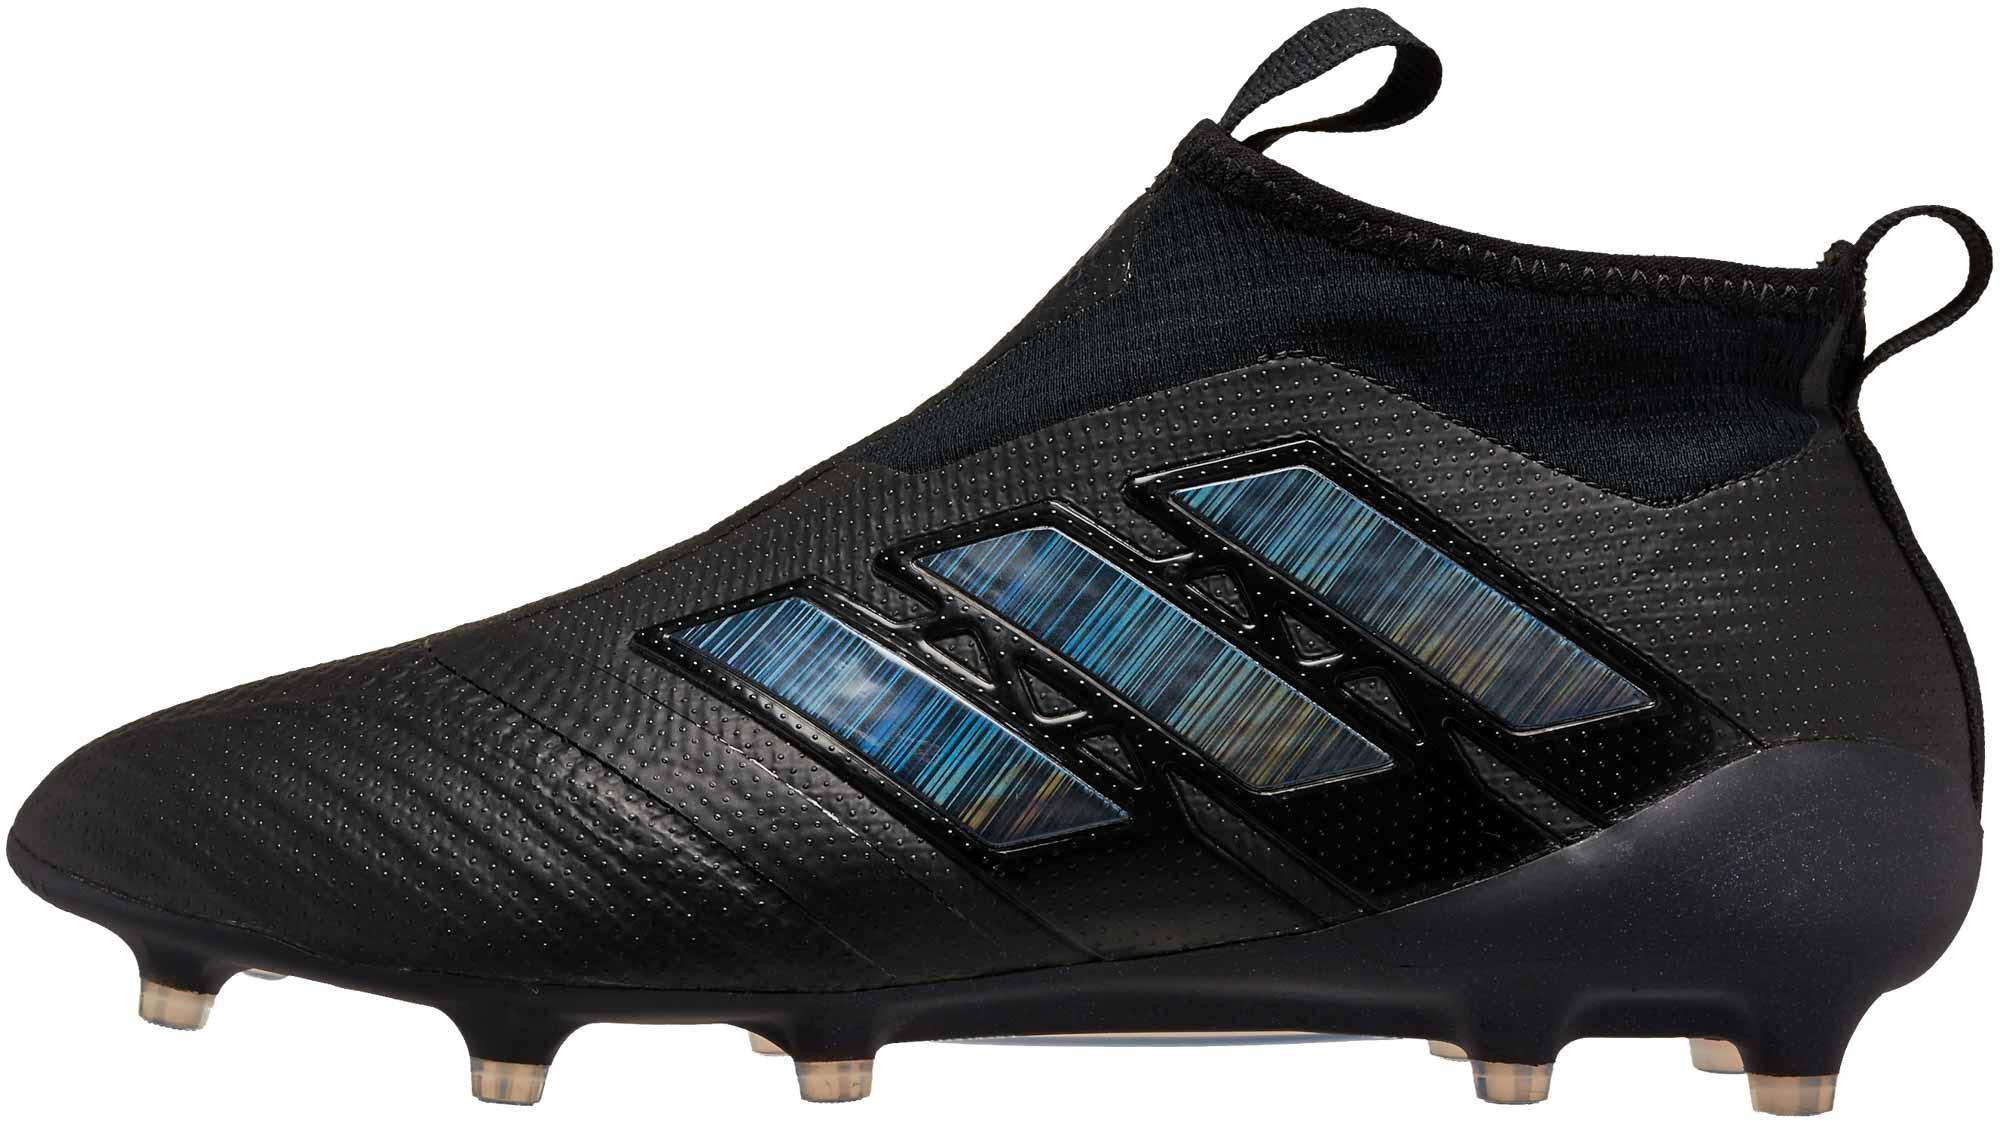 adidas ACE 17+ Purecontrol FG – Black/Utility Black